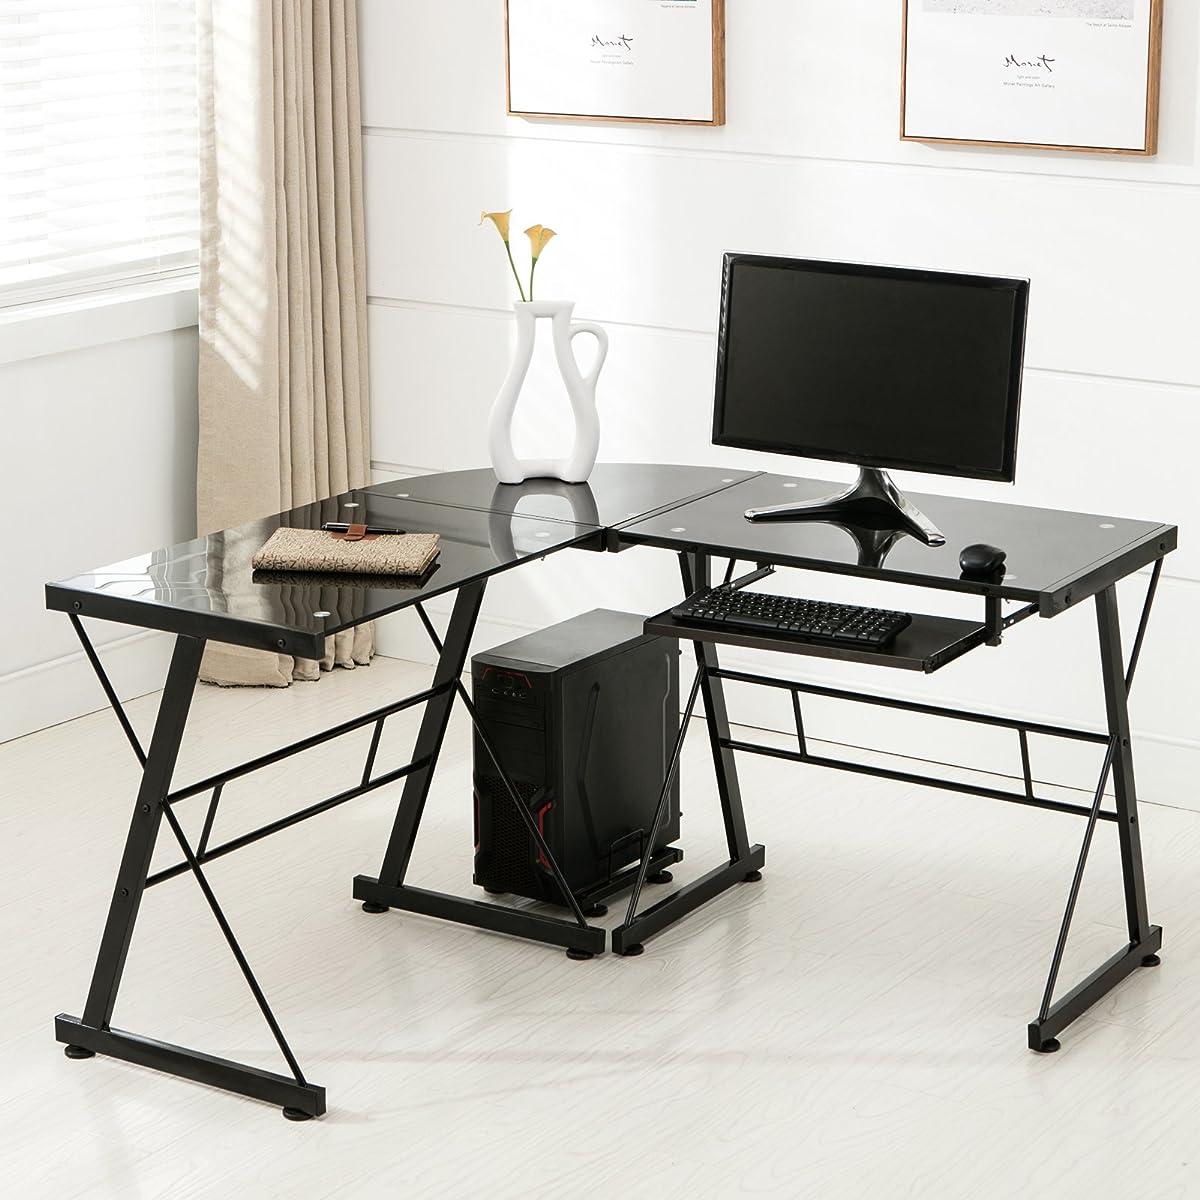 Mecor Computer Desk Corner L-Shape Glass Laptop Table Workstation with Keyboard Tray Home Office Furniture Black